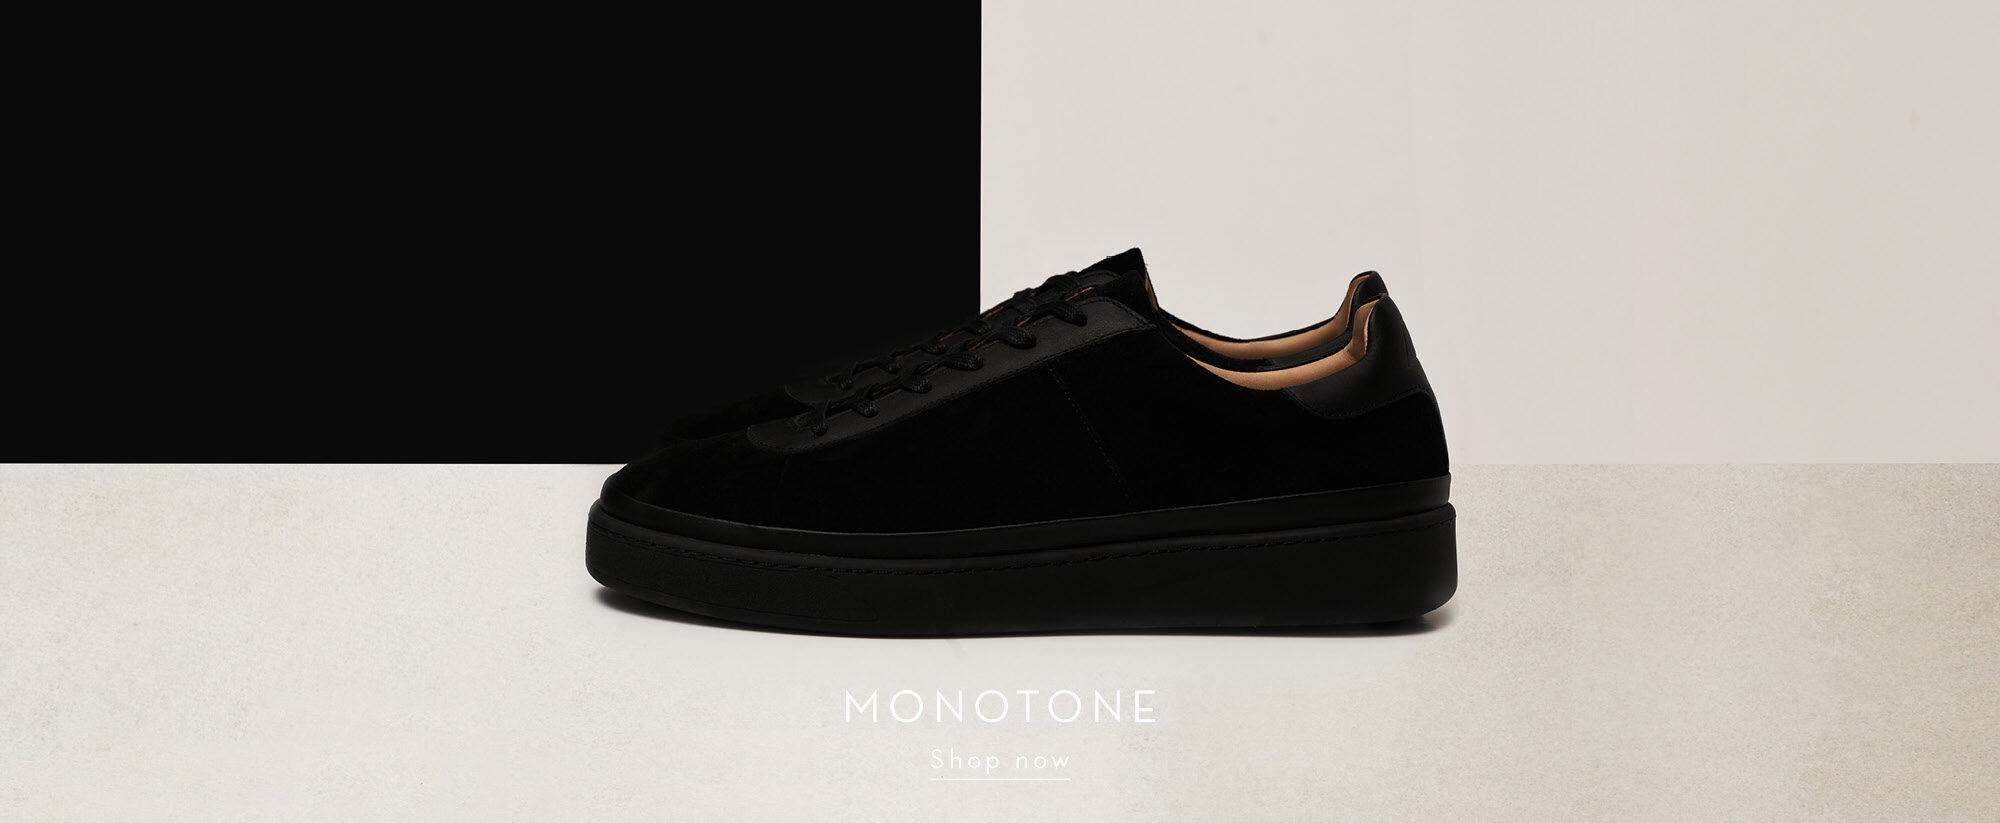 Monotone Mens Shoes - Suede Black Mens Sneakers